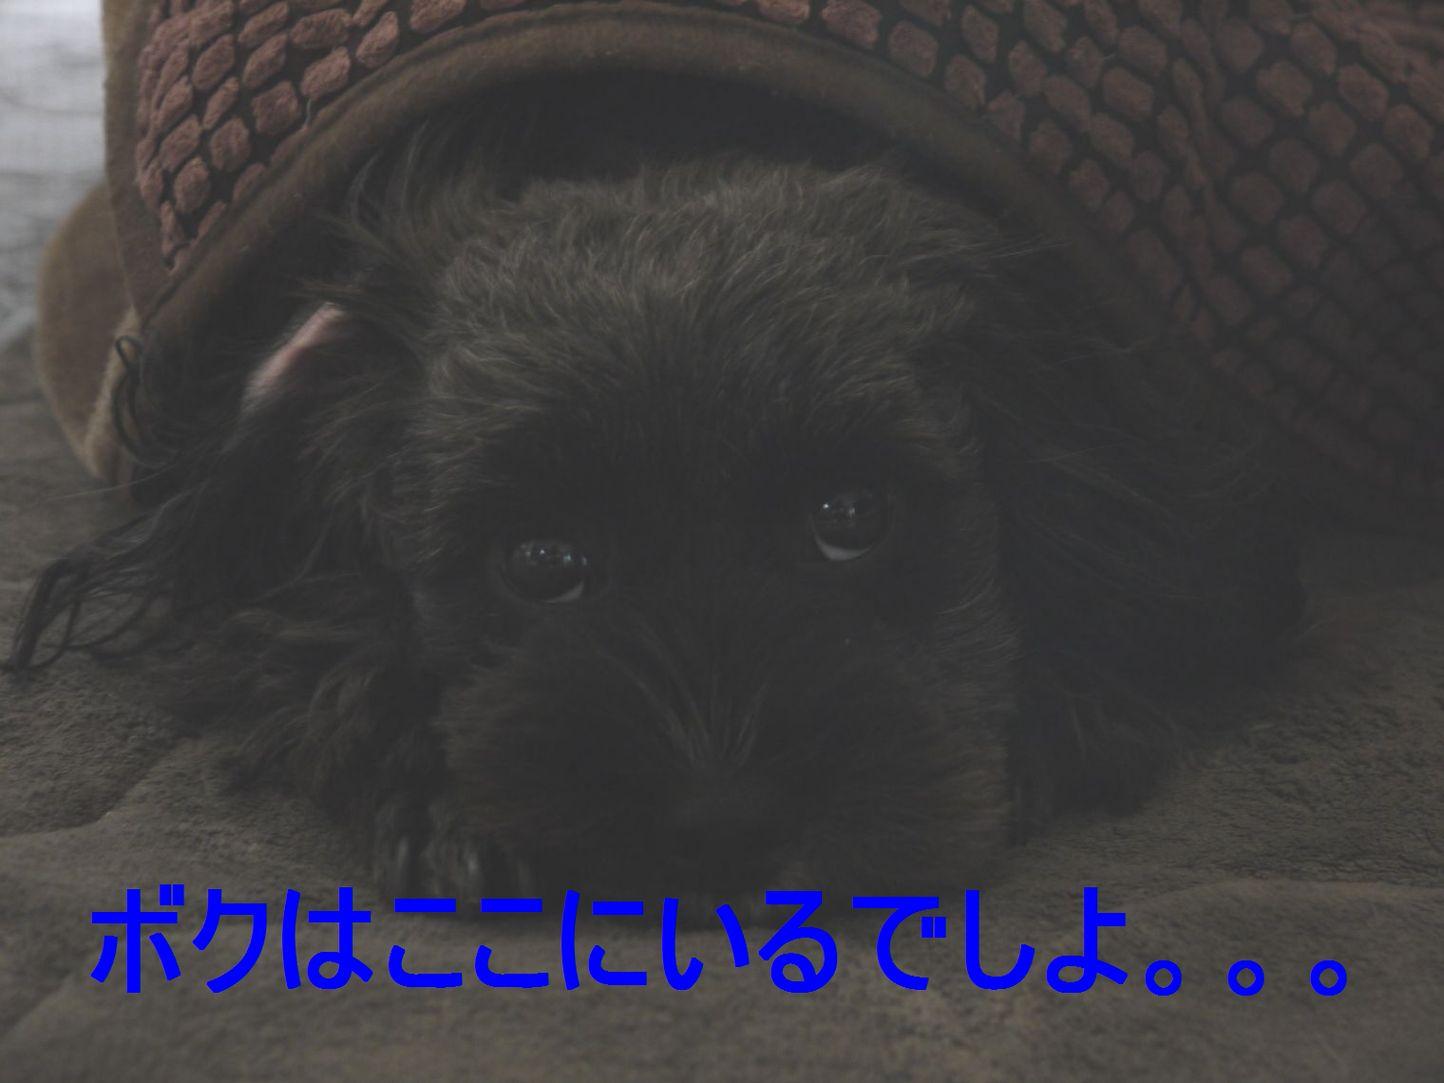 P1200053_a_2